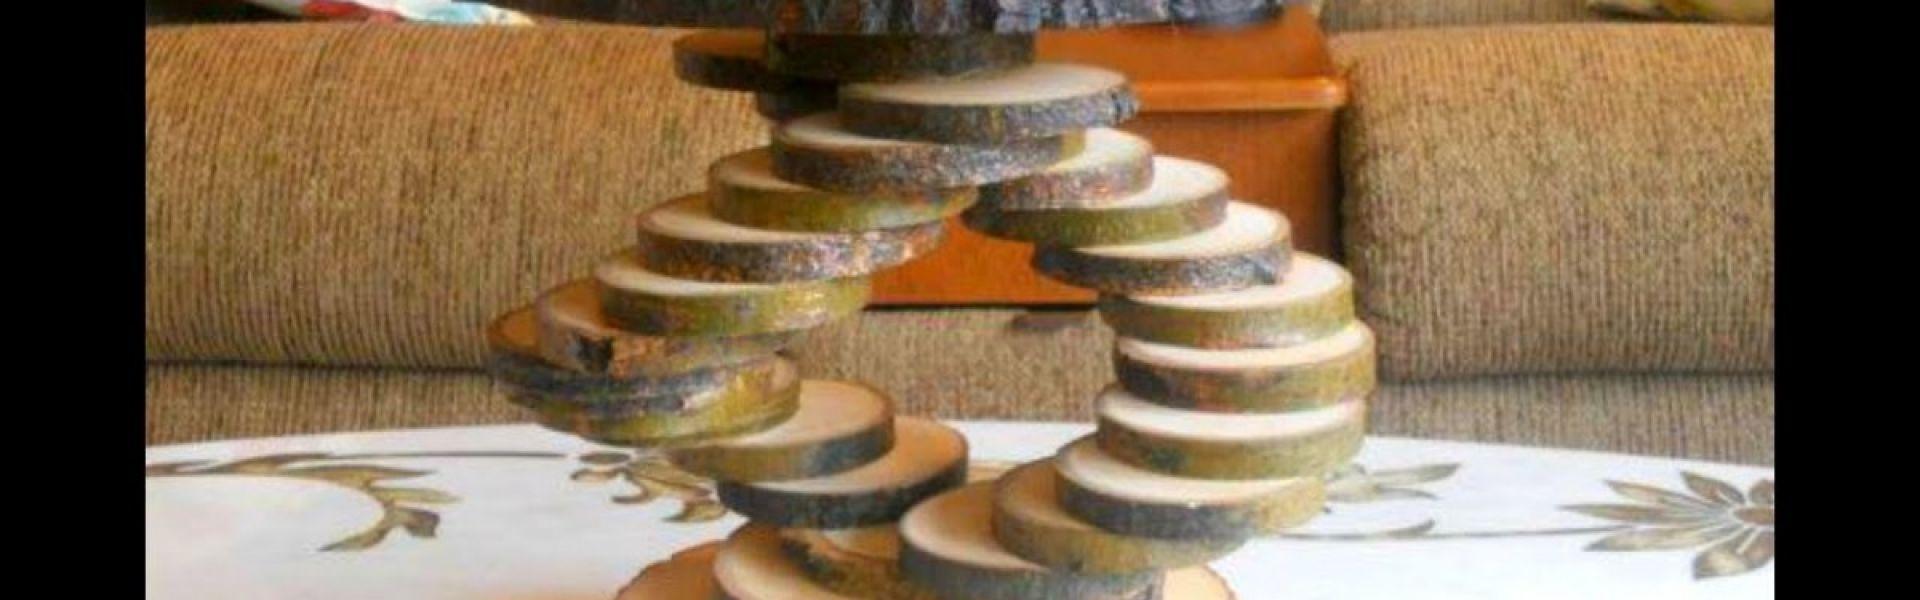 Clasimex.com 80 Log Wood DIY Creative Ideas 2017 - Amazing Log wood home ideas Part.2 Wood Topics